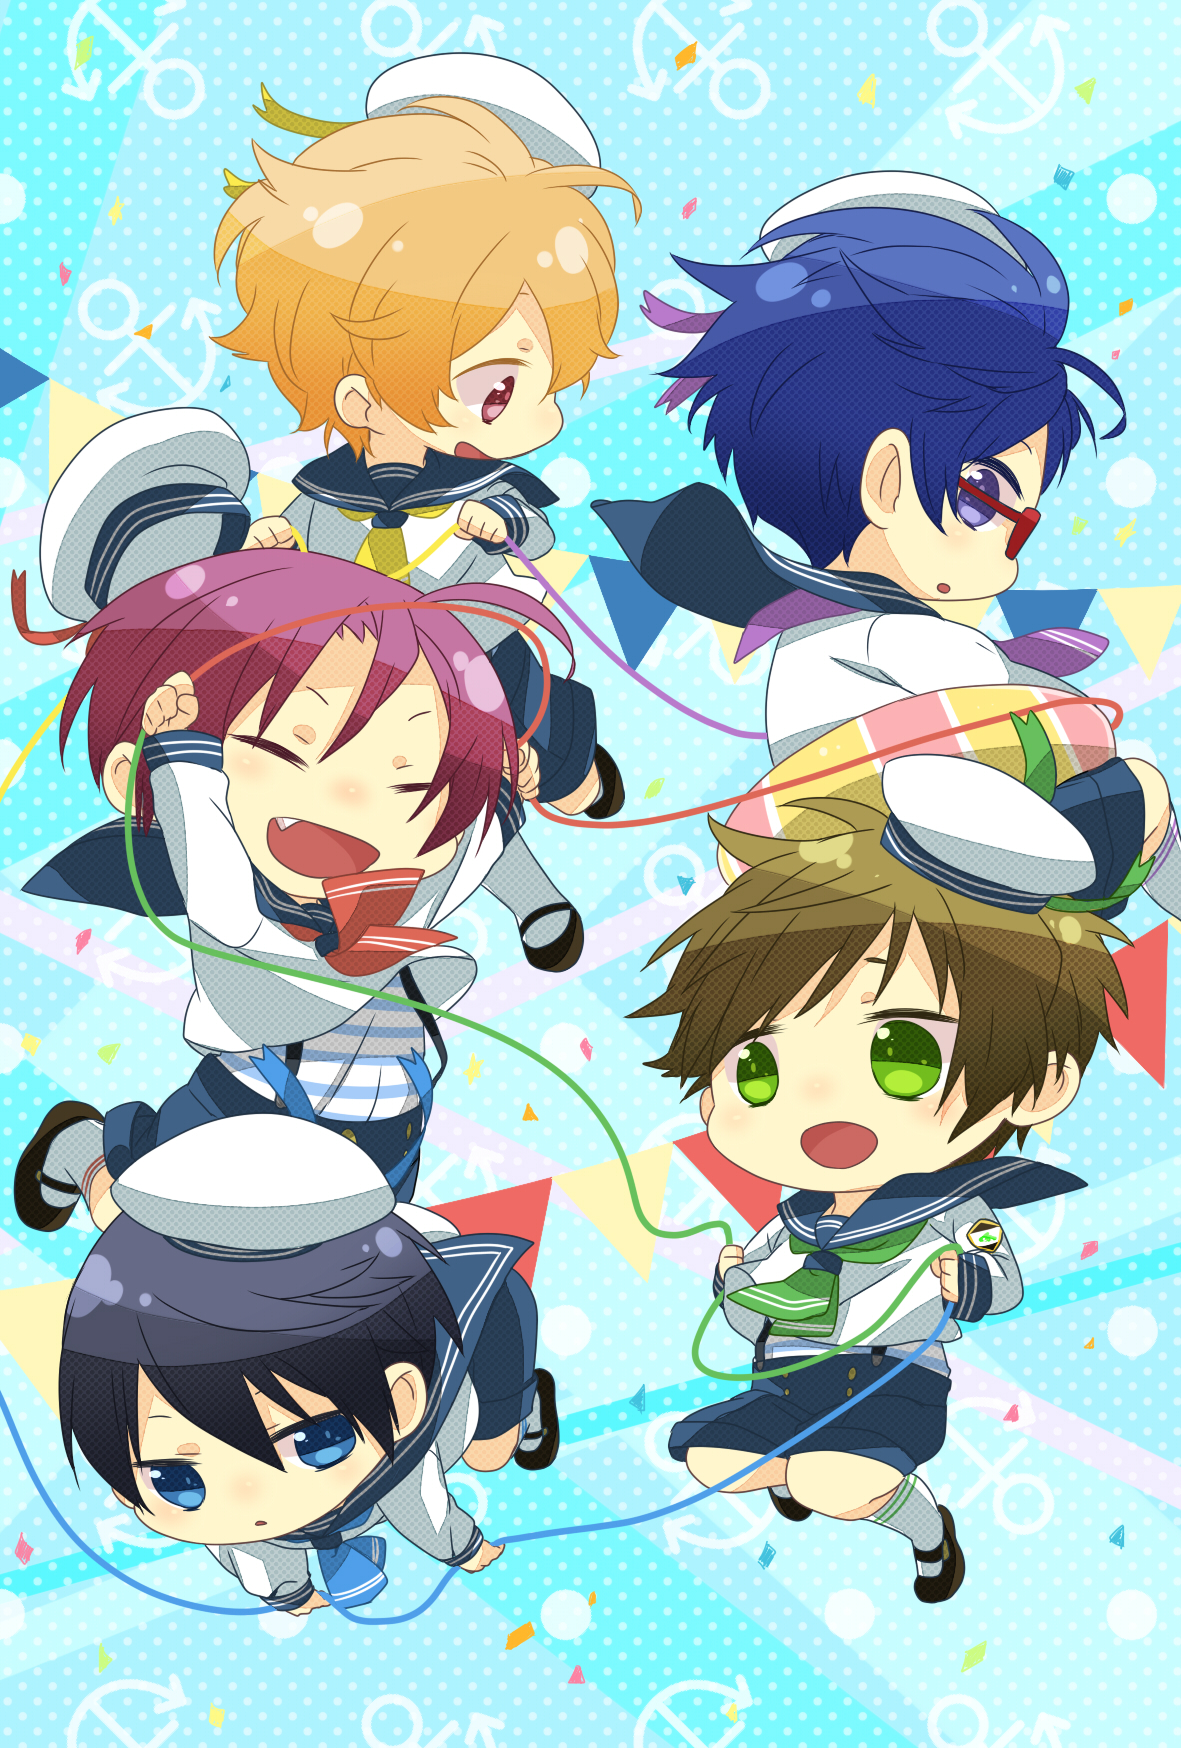 Free Mobile Wallpaper 1739677 Zerochan Anime Image Board